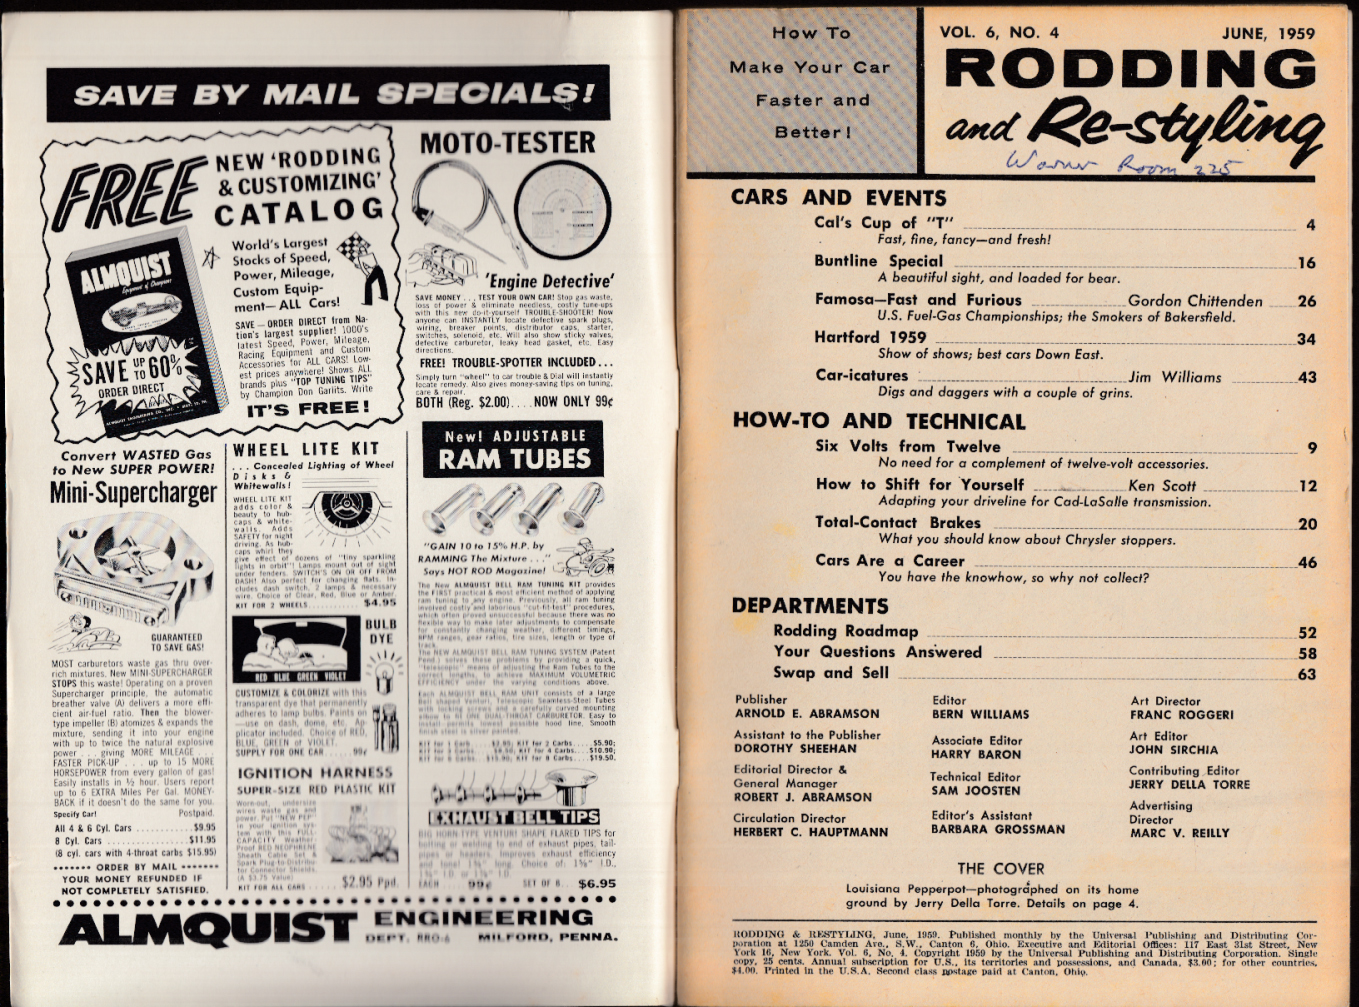 RODDING & RE-STYLING 6 1959 Bayou Brute '27 T-bucket; Cadillac tranny swap